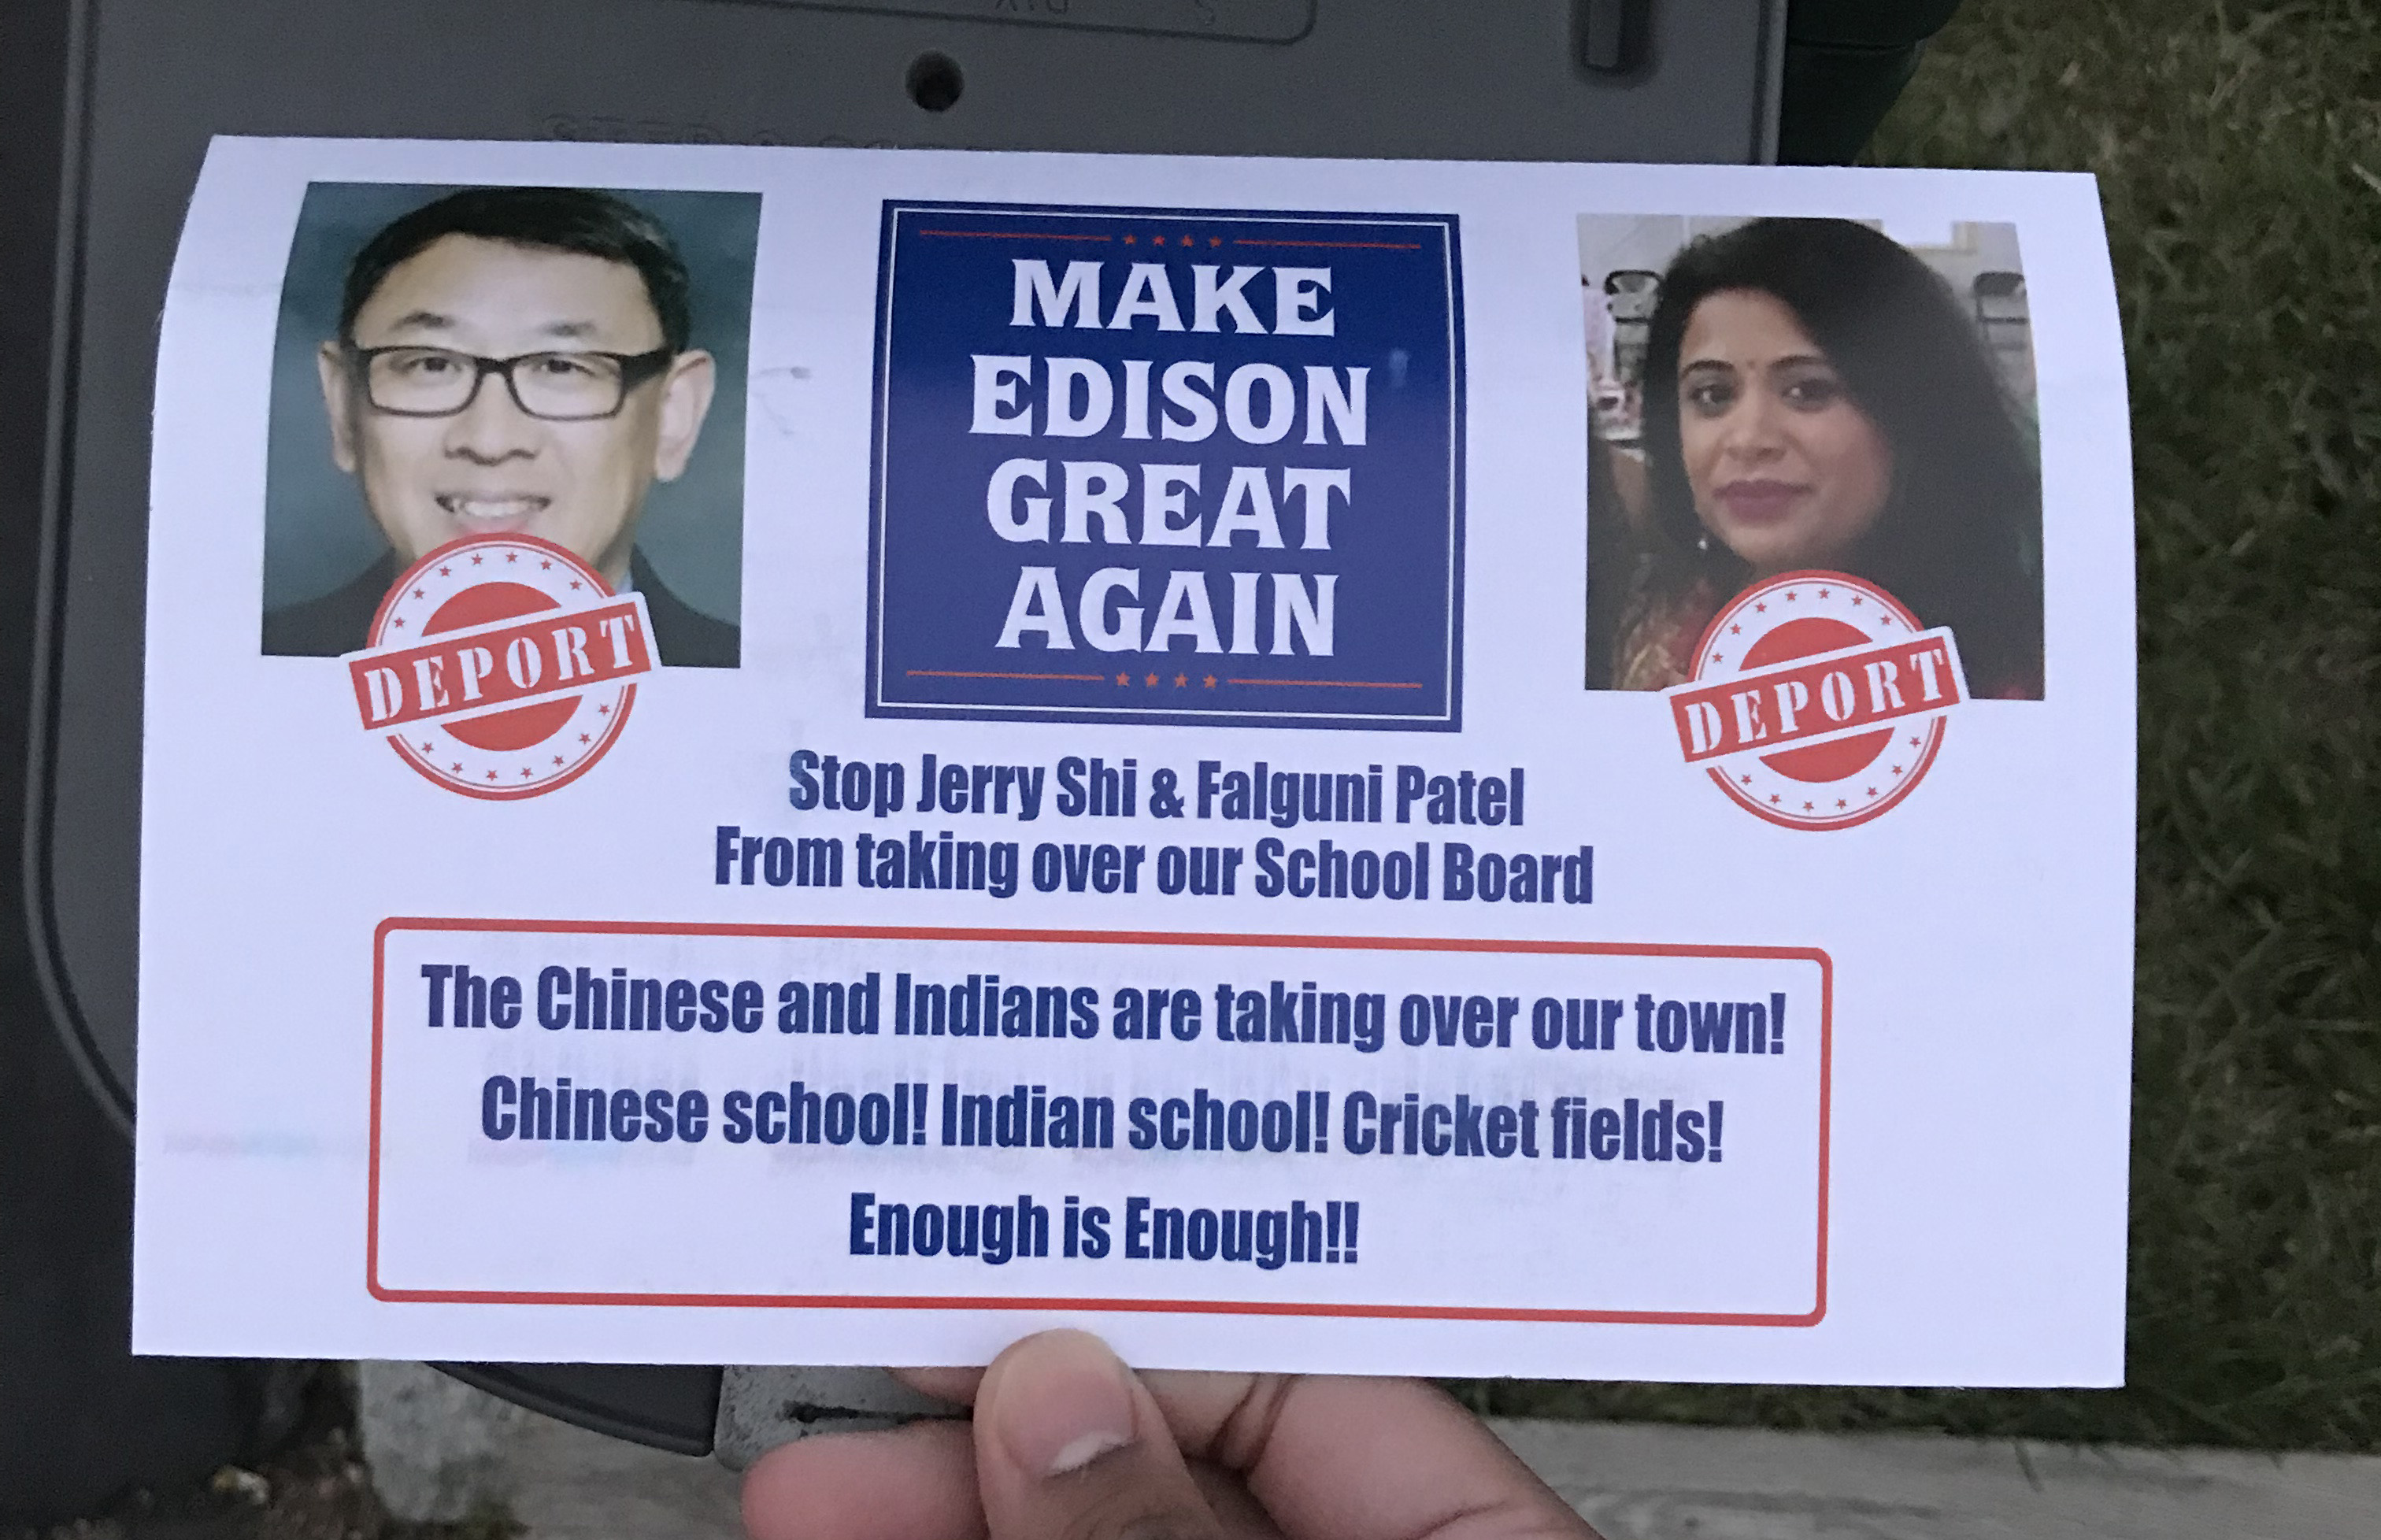 deport flyers targeting asian american candidates shock n j township